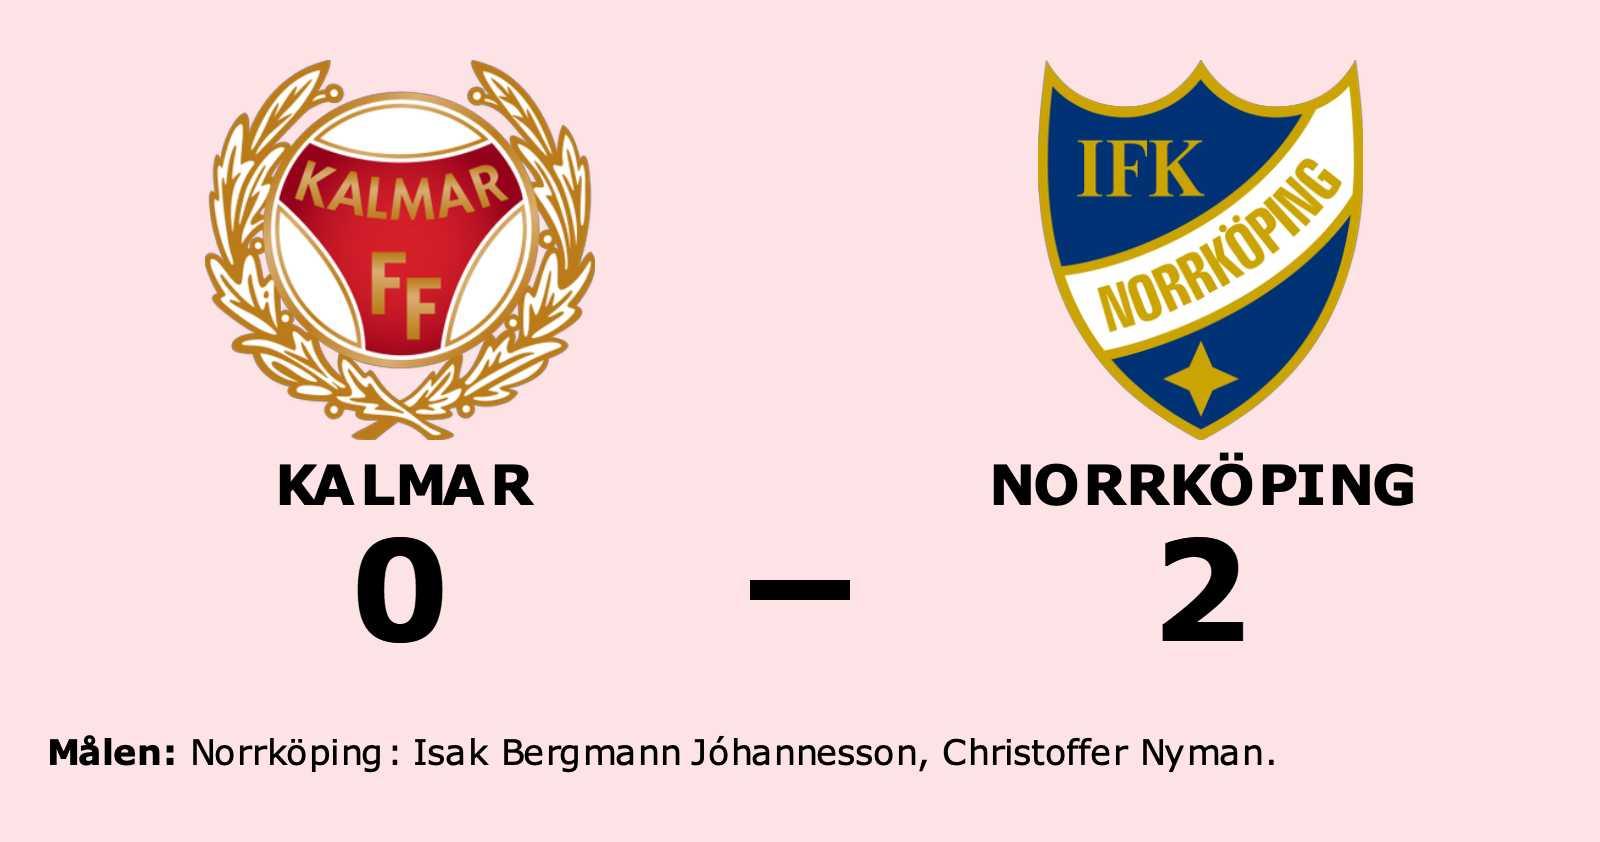 Bergmann Jóhannesson och Nyman målgörare i Norrköpings seger